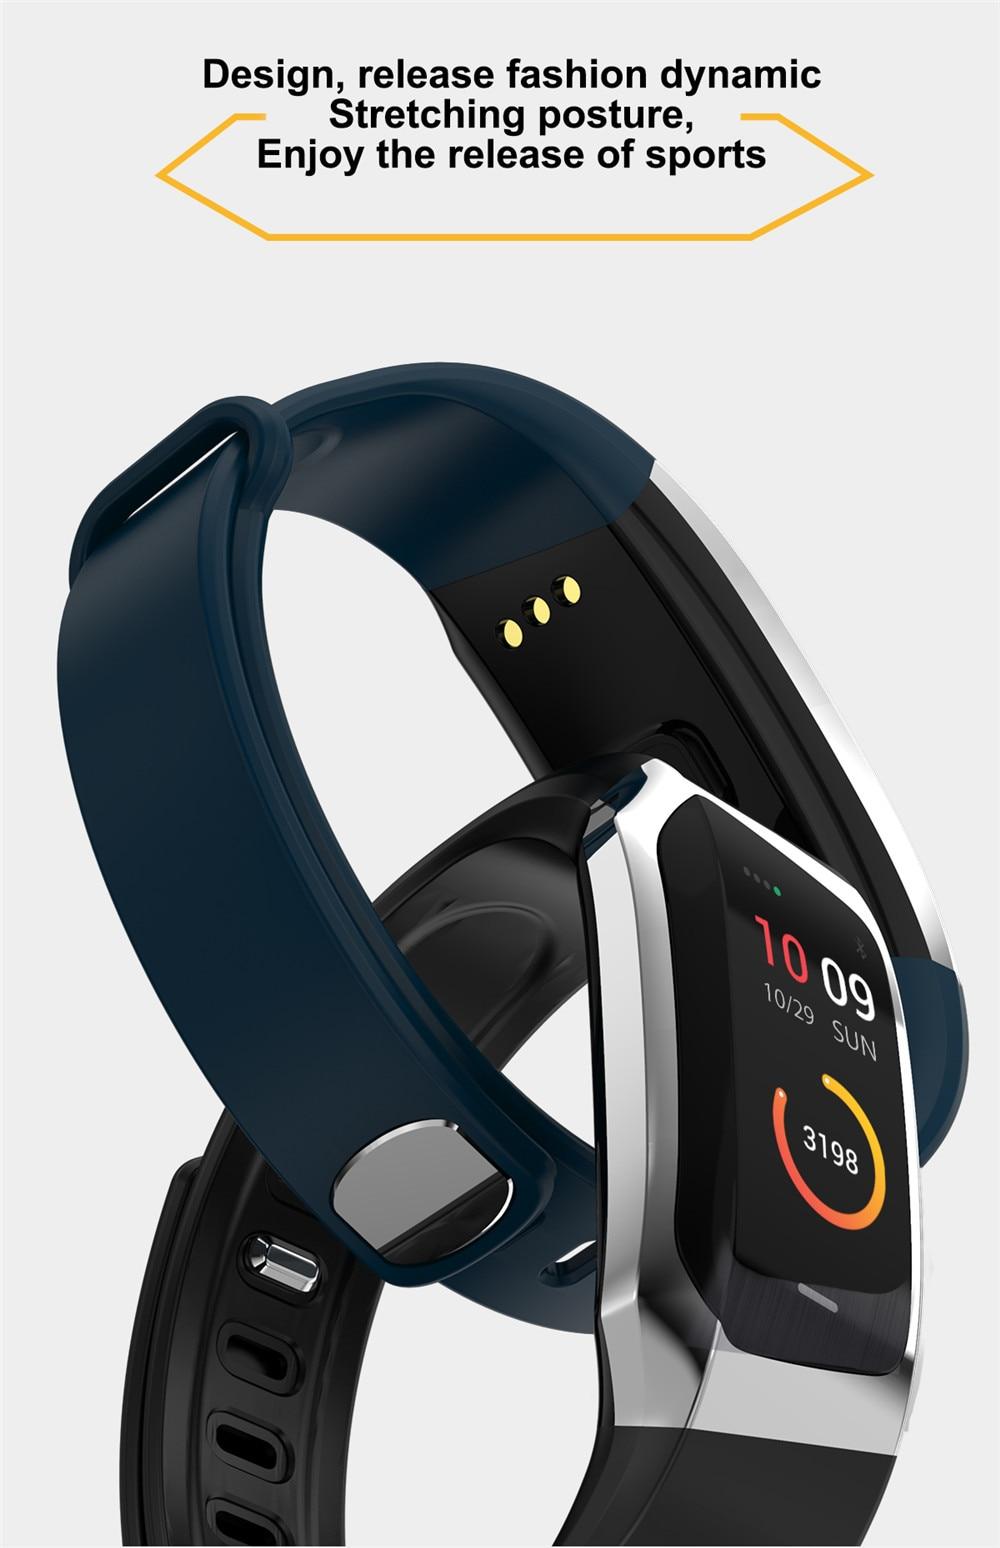 HTB1QKiTdjfguuRjSspaq6yXVXXaB Greentiger E18 Smart Bracelet Blood Pressure Heart Rate Monitor Fitness Tracker smart watch IP67 Waterproof camera Sports Band